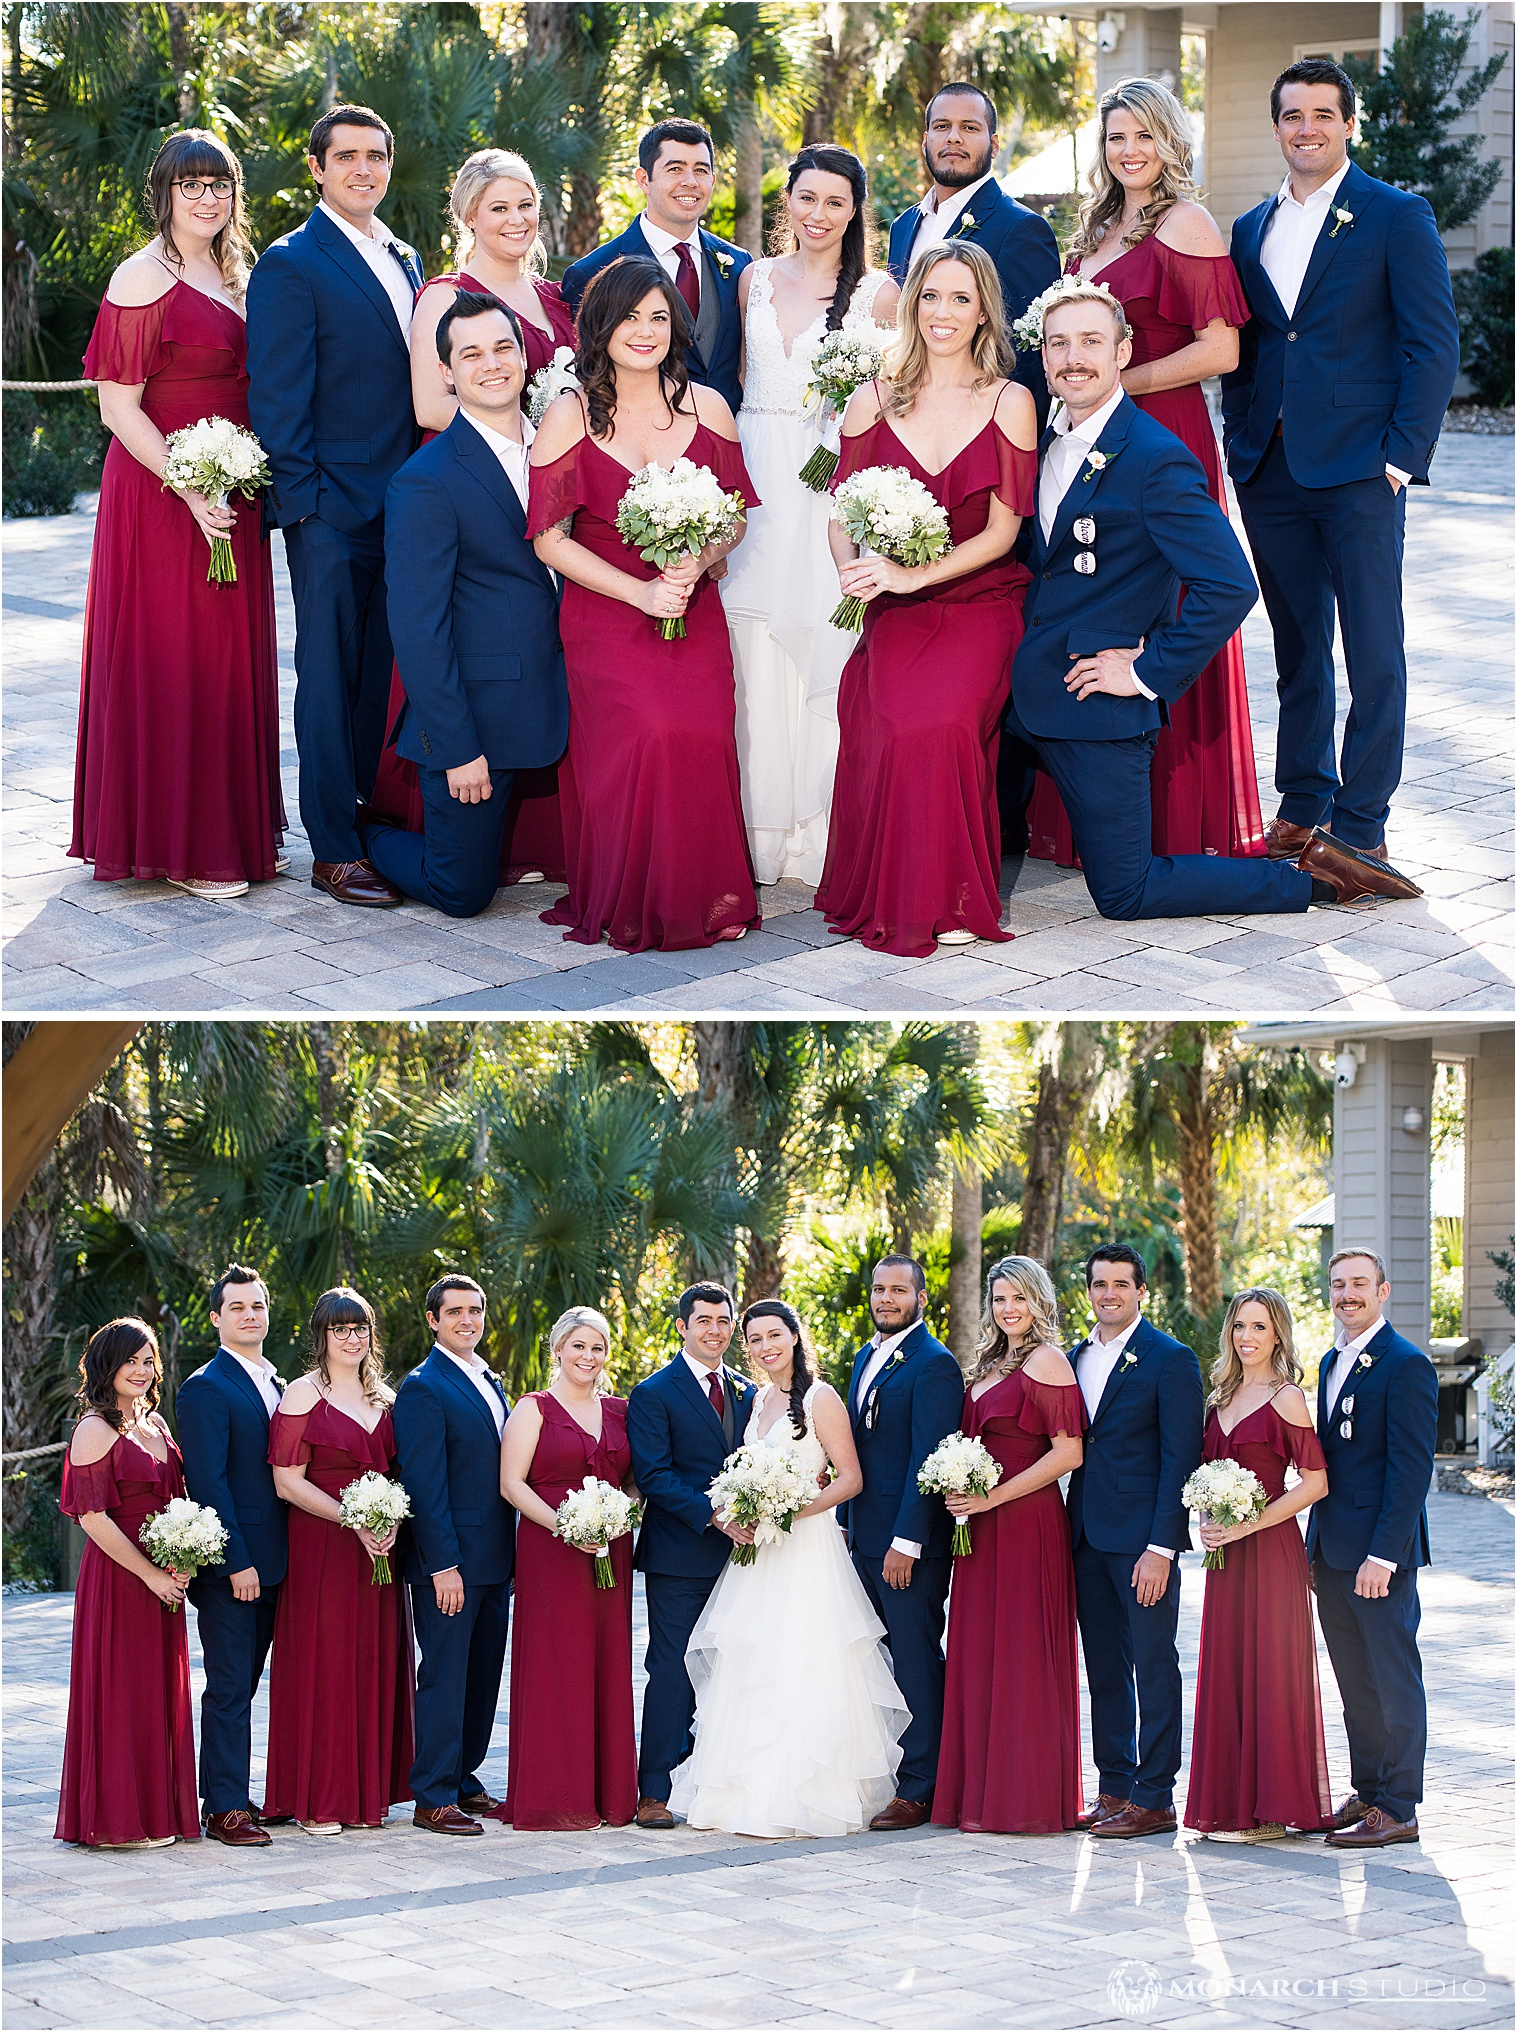 Wedding-photographer-in-sanford-florida-natural-wedding-022.jpg